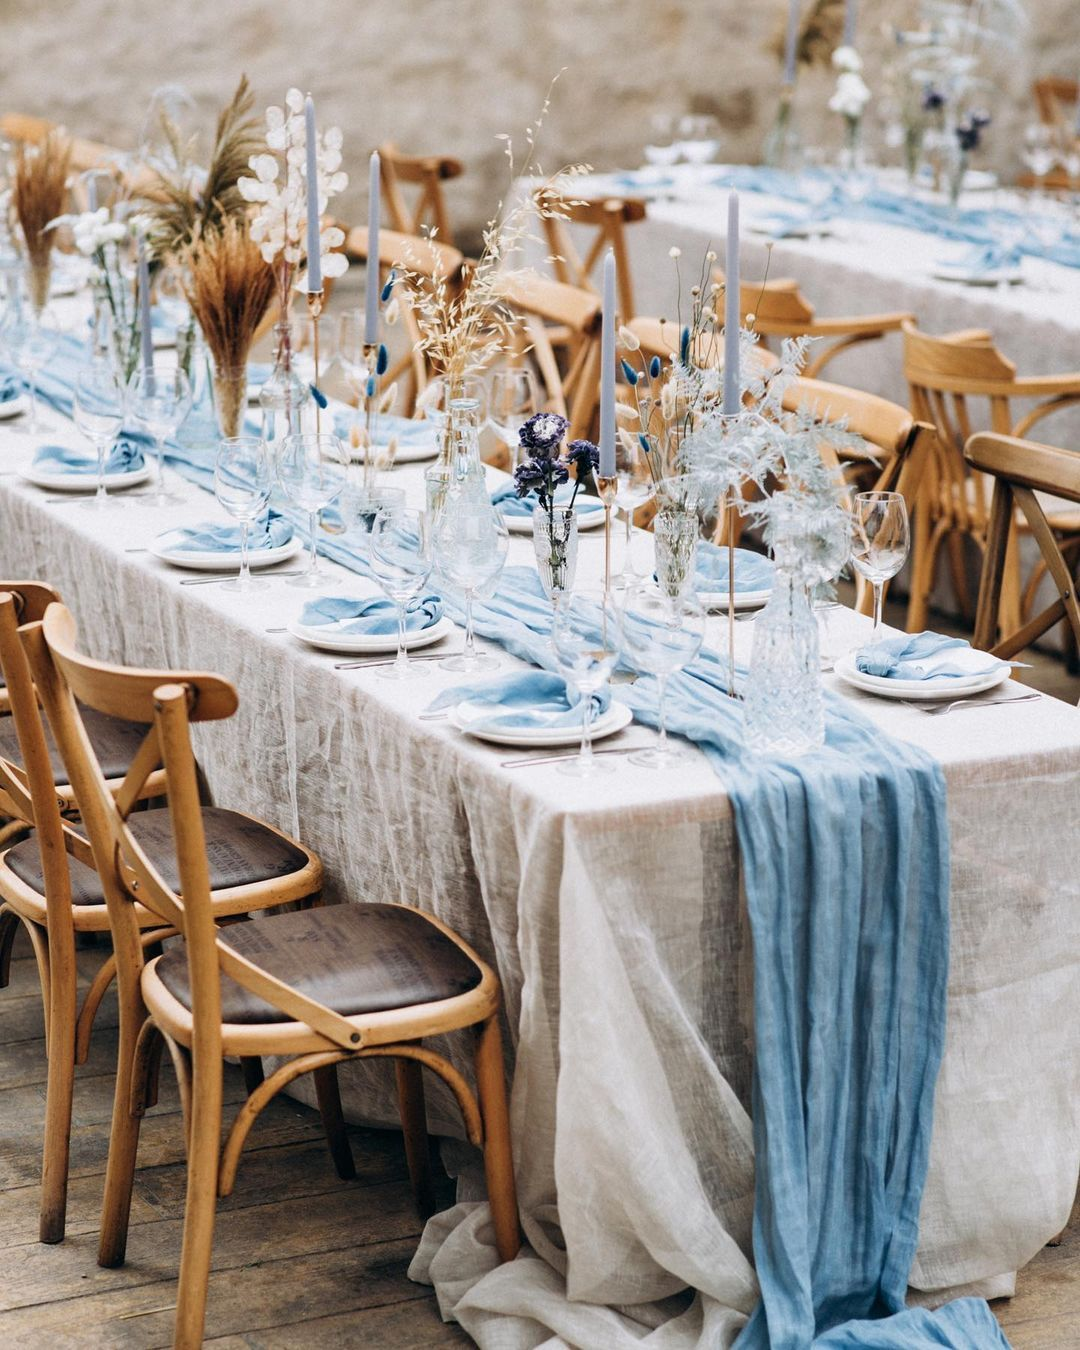 Beach-Blue Table Runner